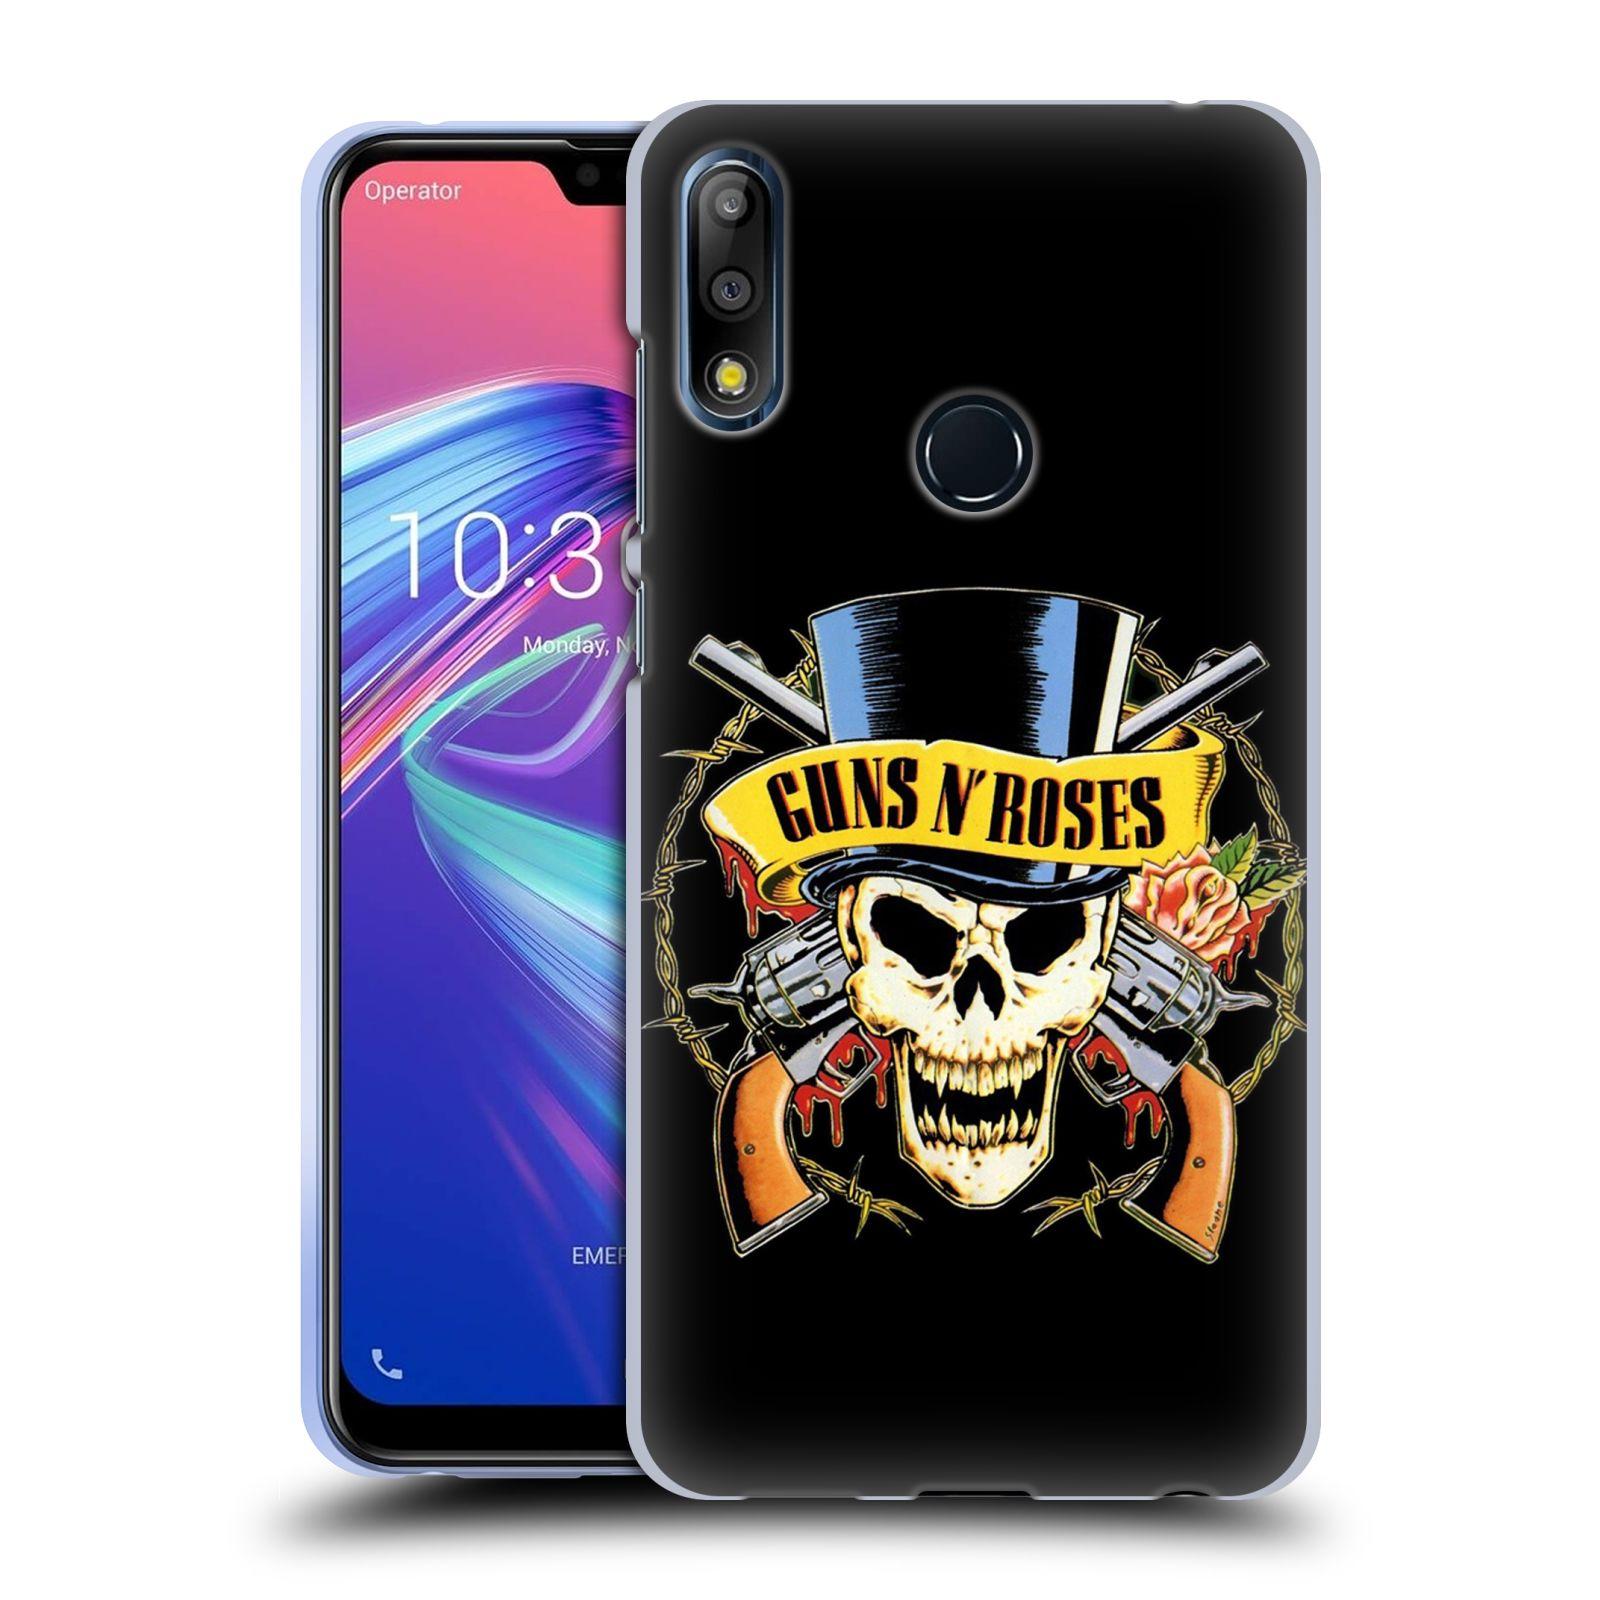 Silikonové pouzdro na mobil Asus Zenfone Max Pro M2 ZB631KL - Head Case - Guns N' Roses - Lebka